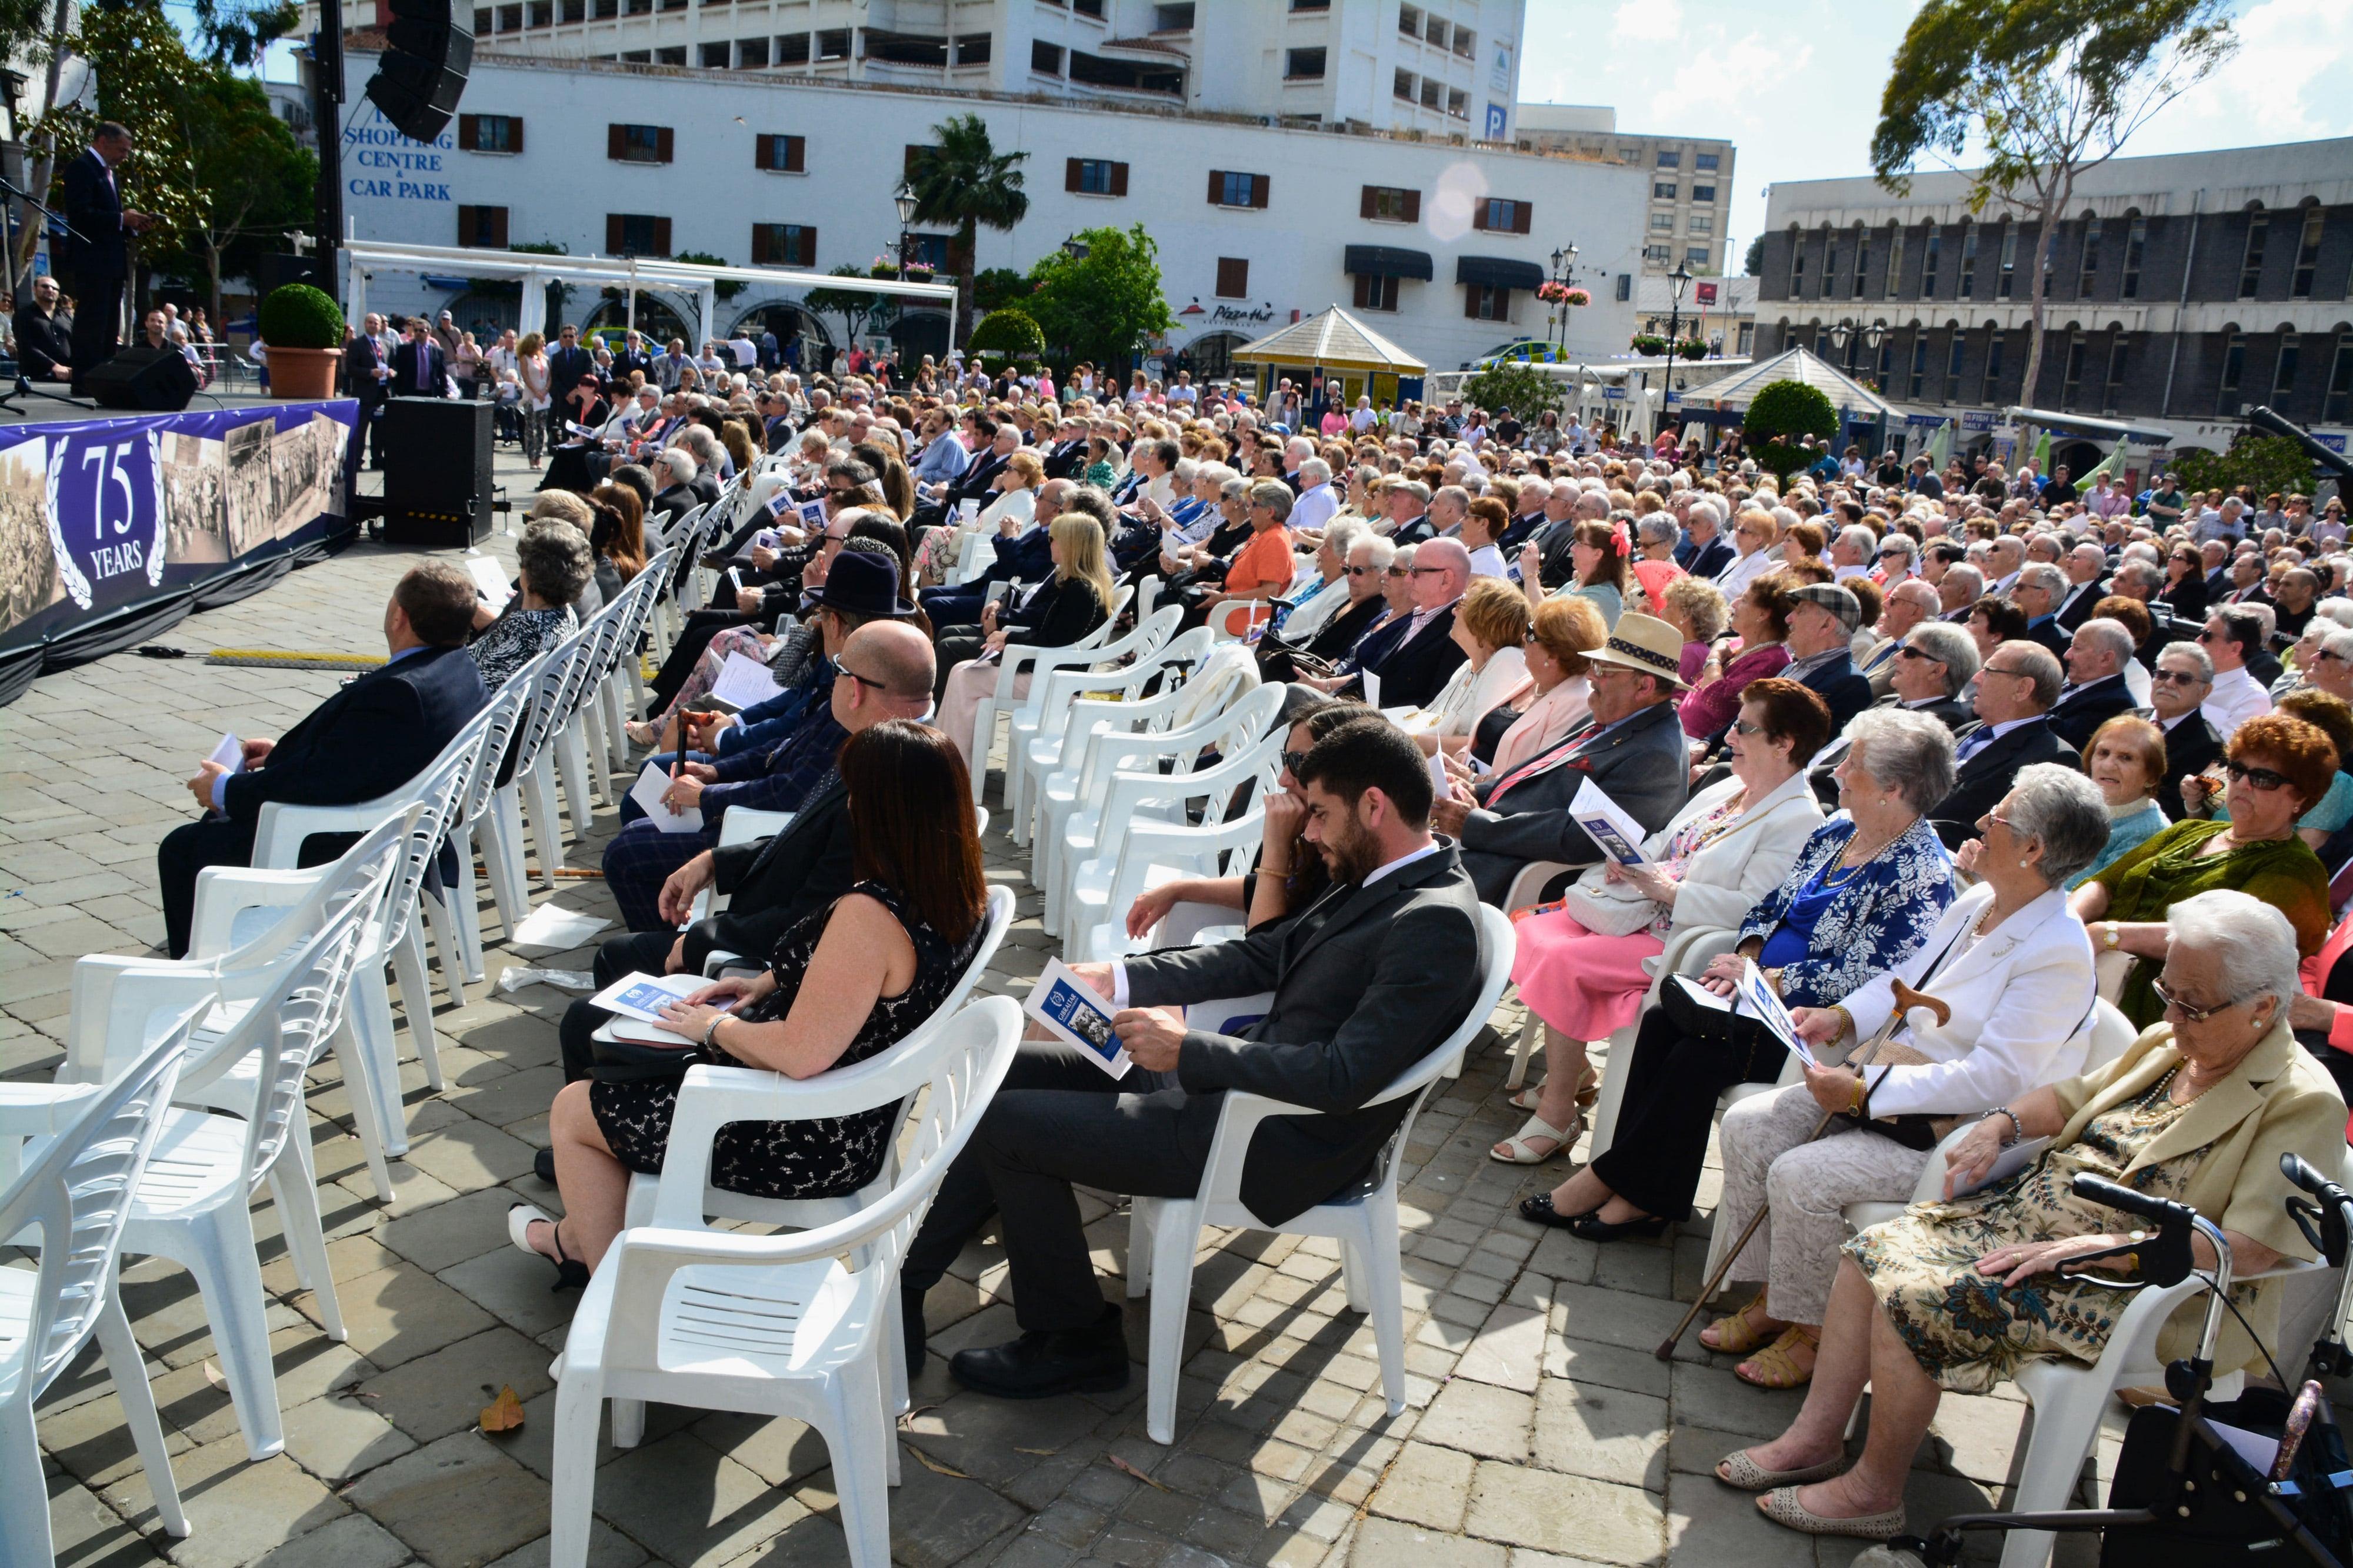 gibraltar-evacuation-dsc_3650_17818045909_o